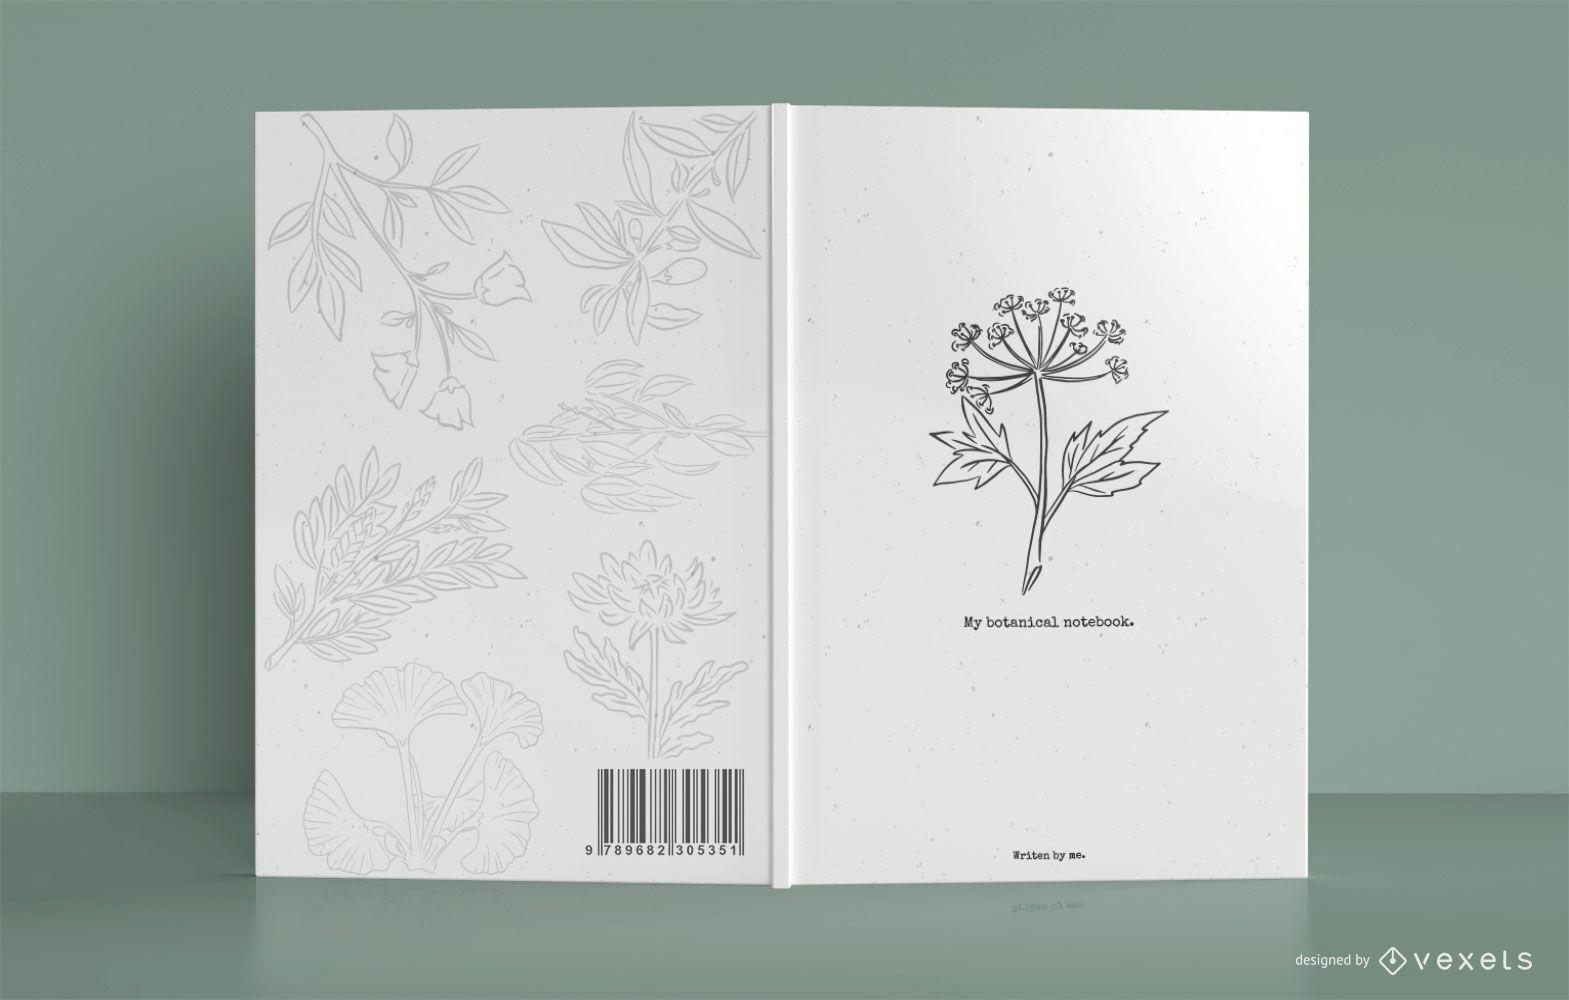 My botanical notebook cover design